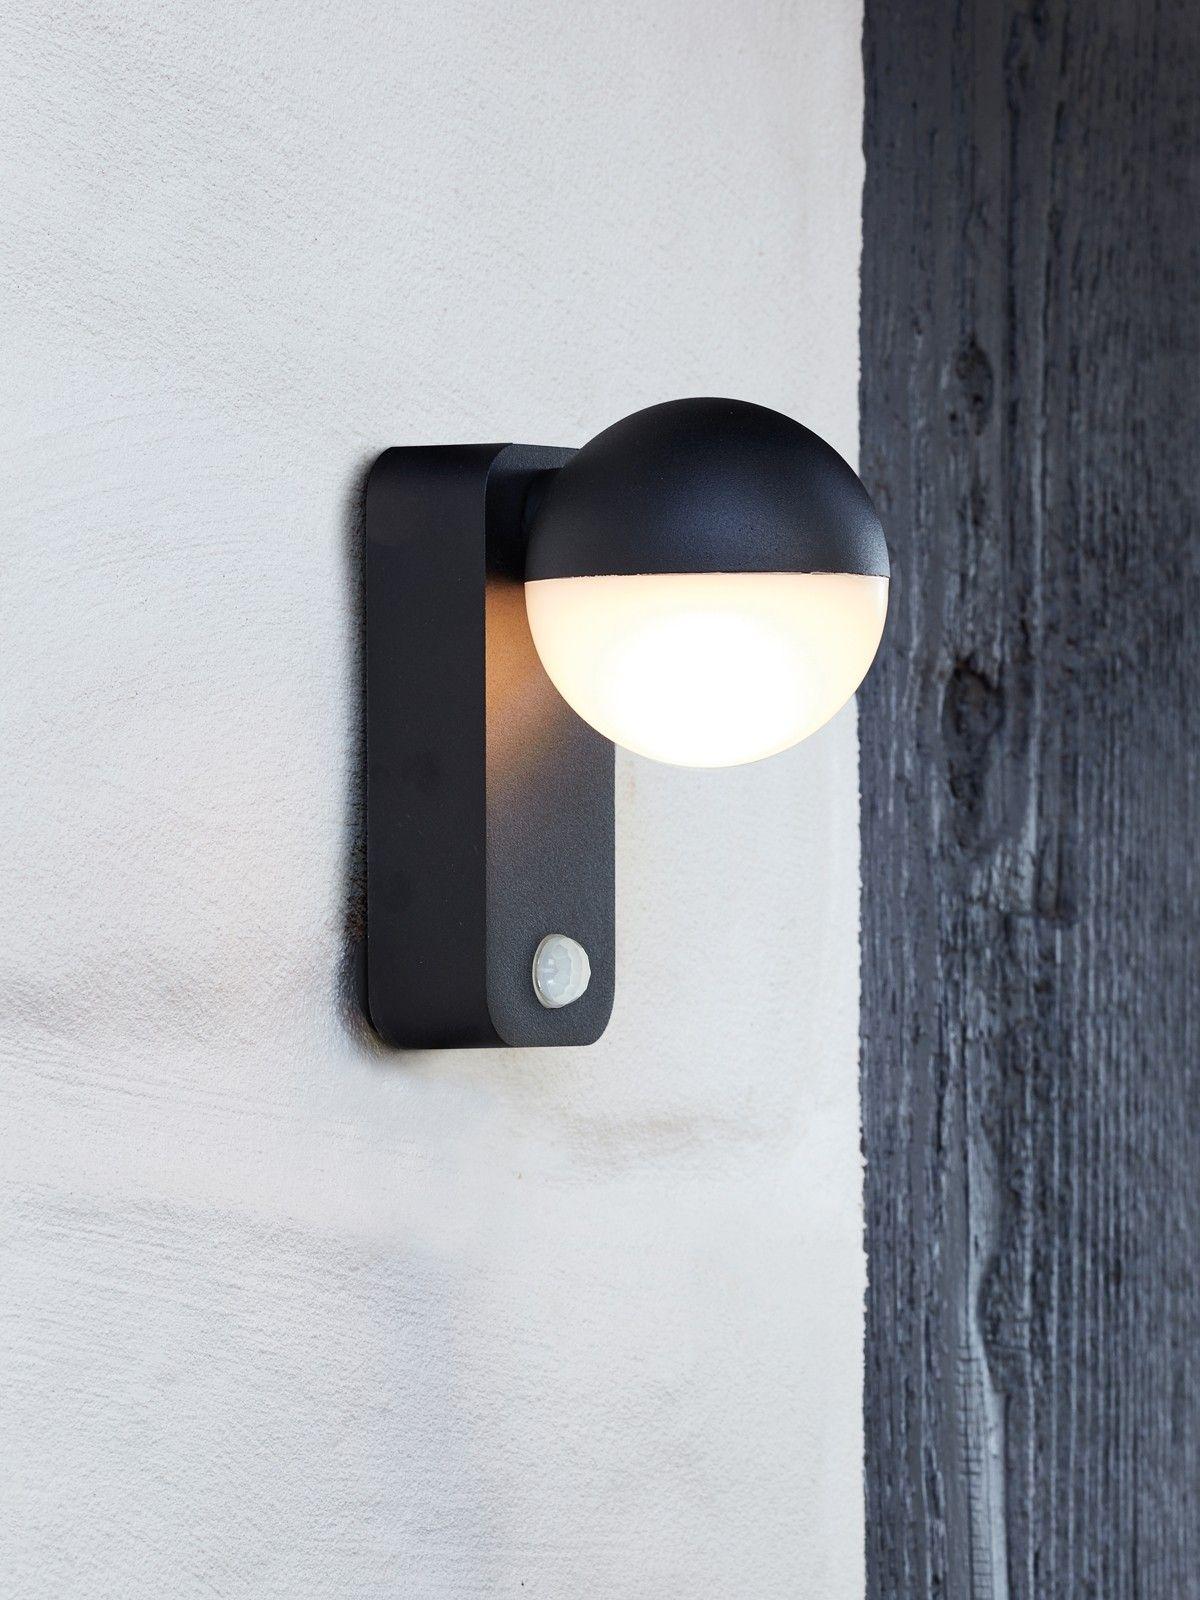 Ledlux Polo Led Ip65 Wallbracket With Sensor In Black Led Outdoor Lighting Beacon Lighting Lighting